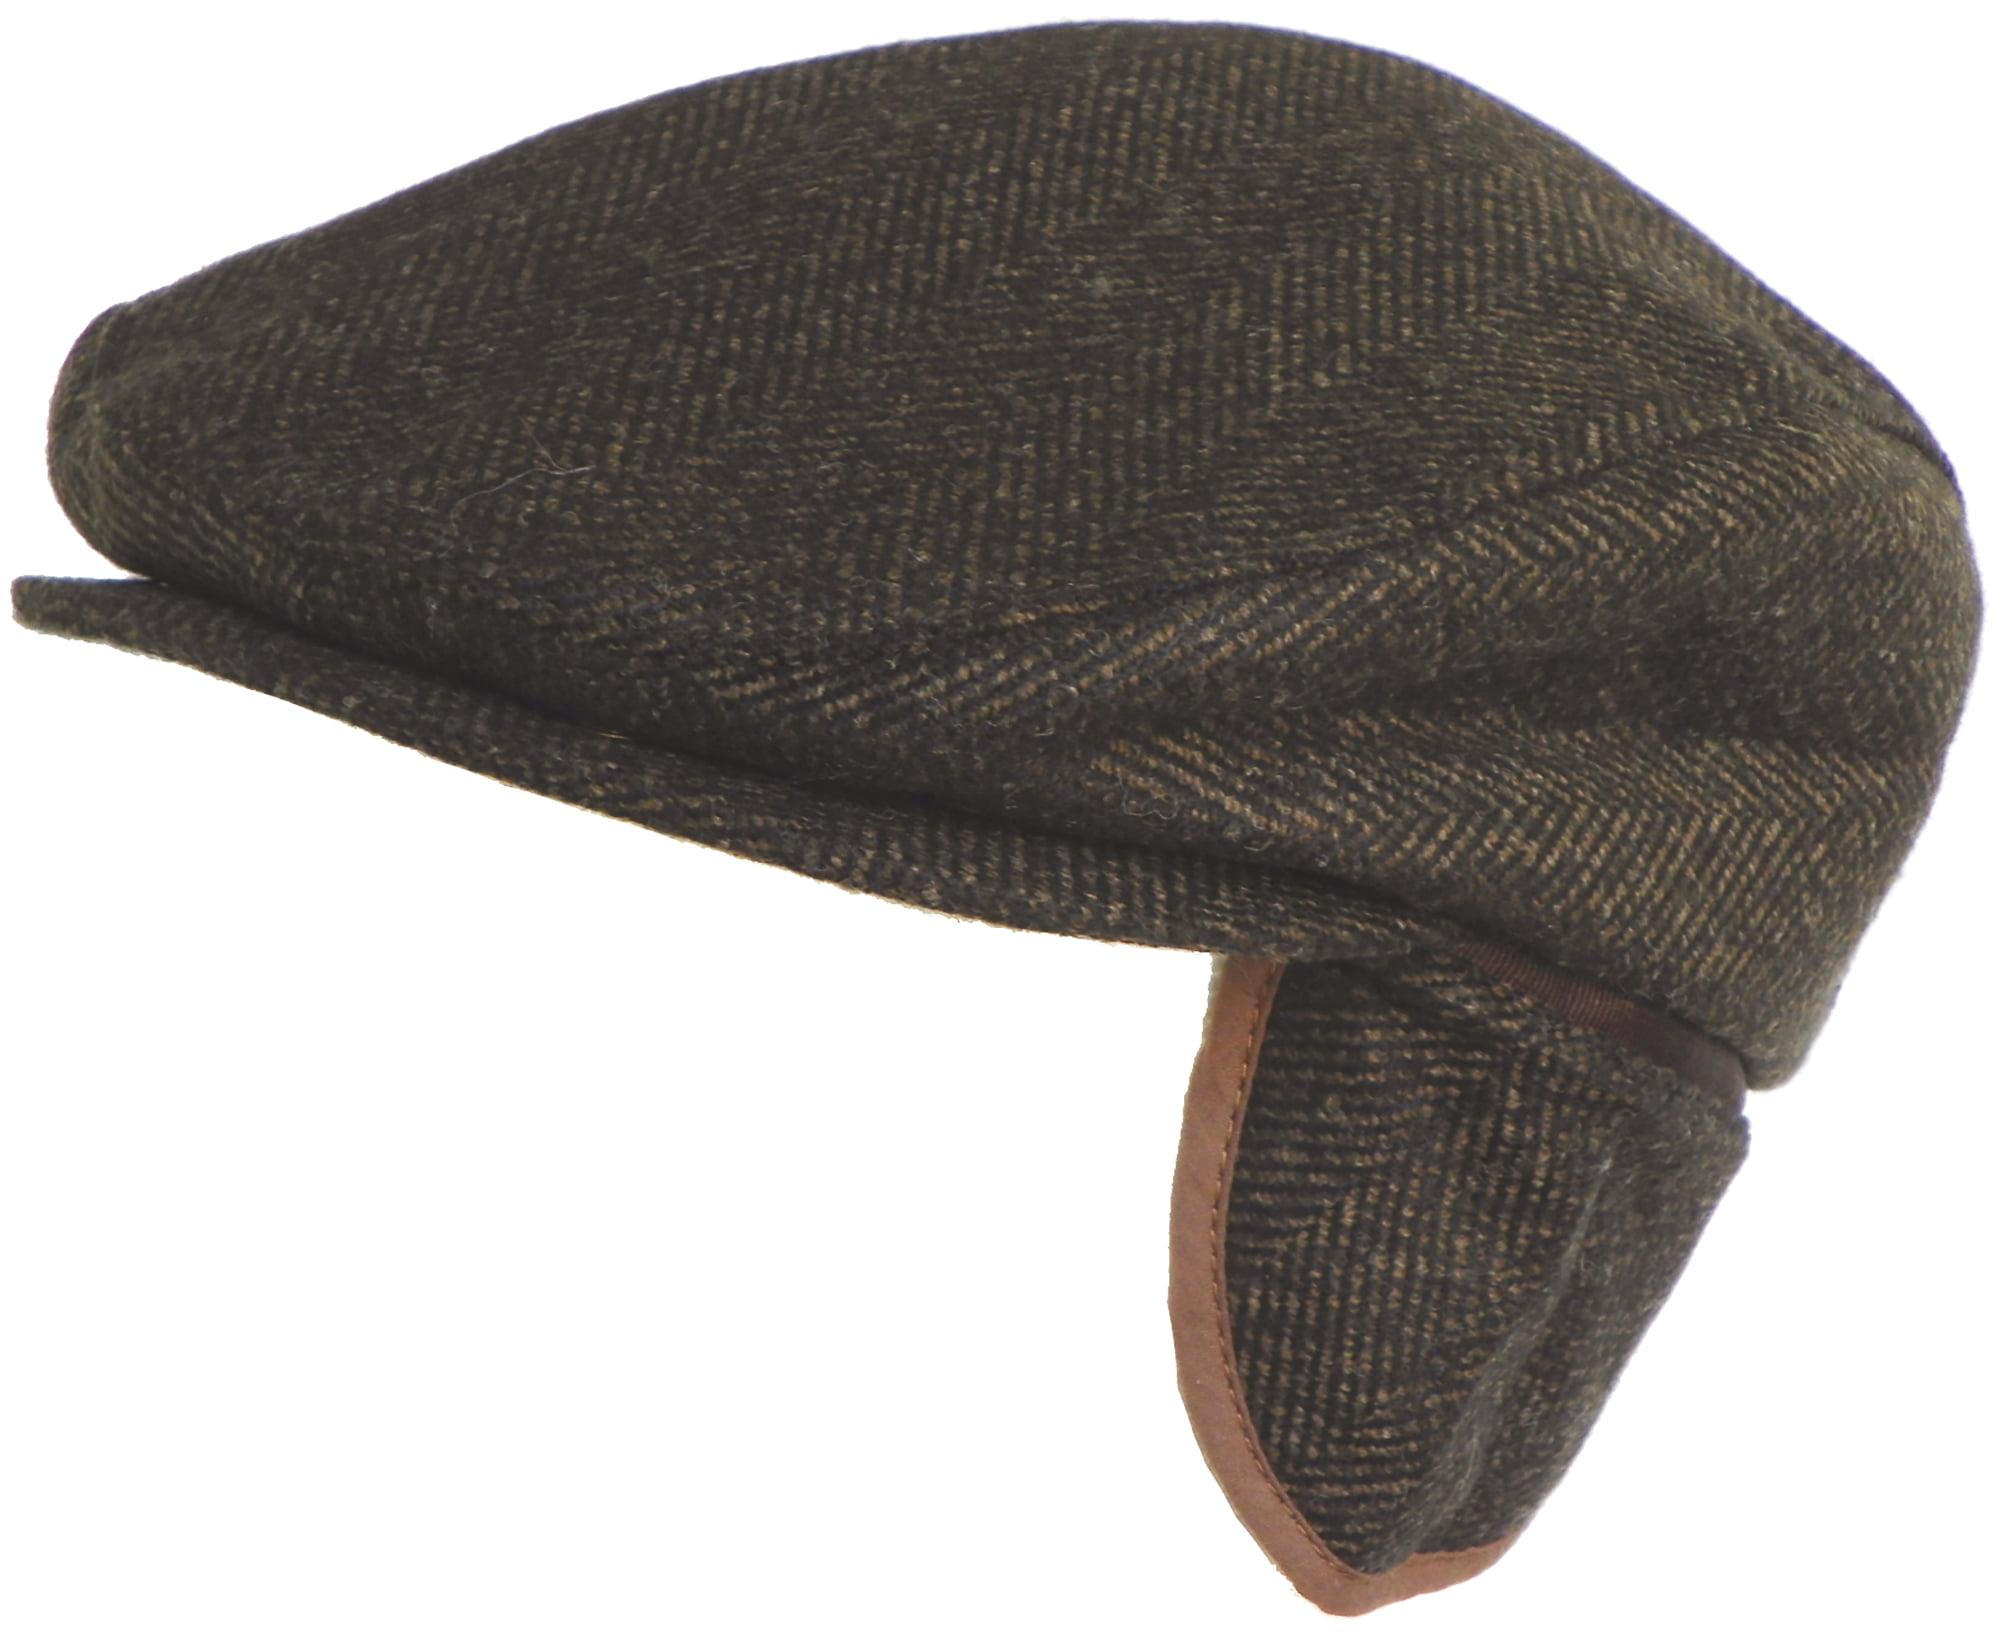 840a8a9b5d514 Herringbone Wool Blend Ear Flap Ivy Cap Winter Irish Hat Driver Scally Flat  Newsboy Gatsby - Walmart.com